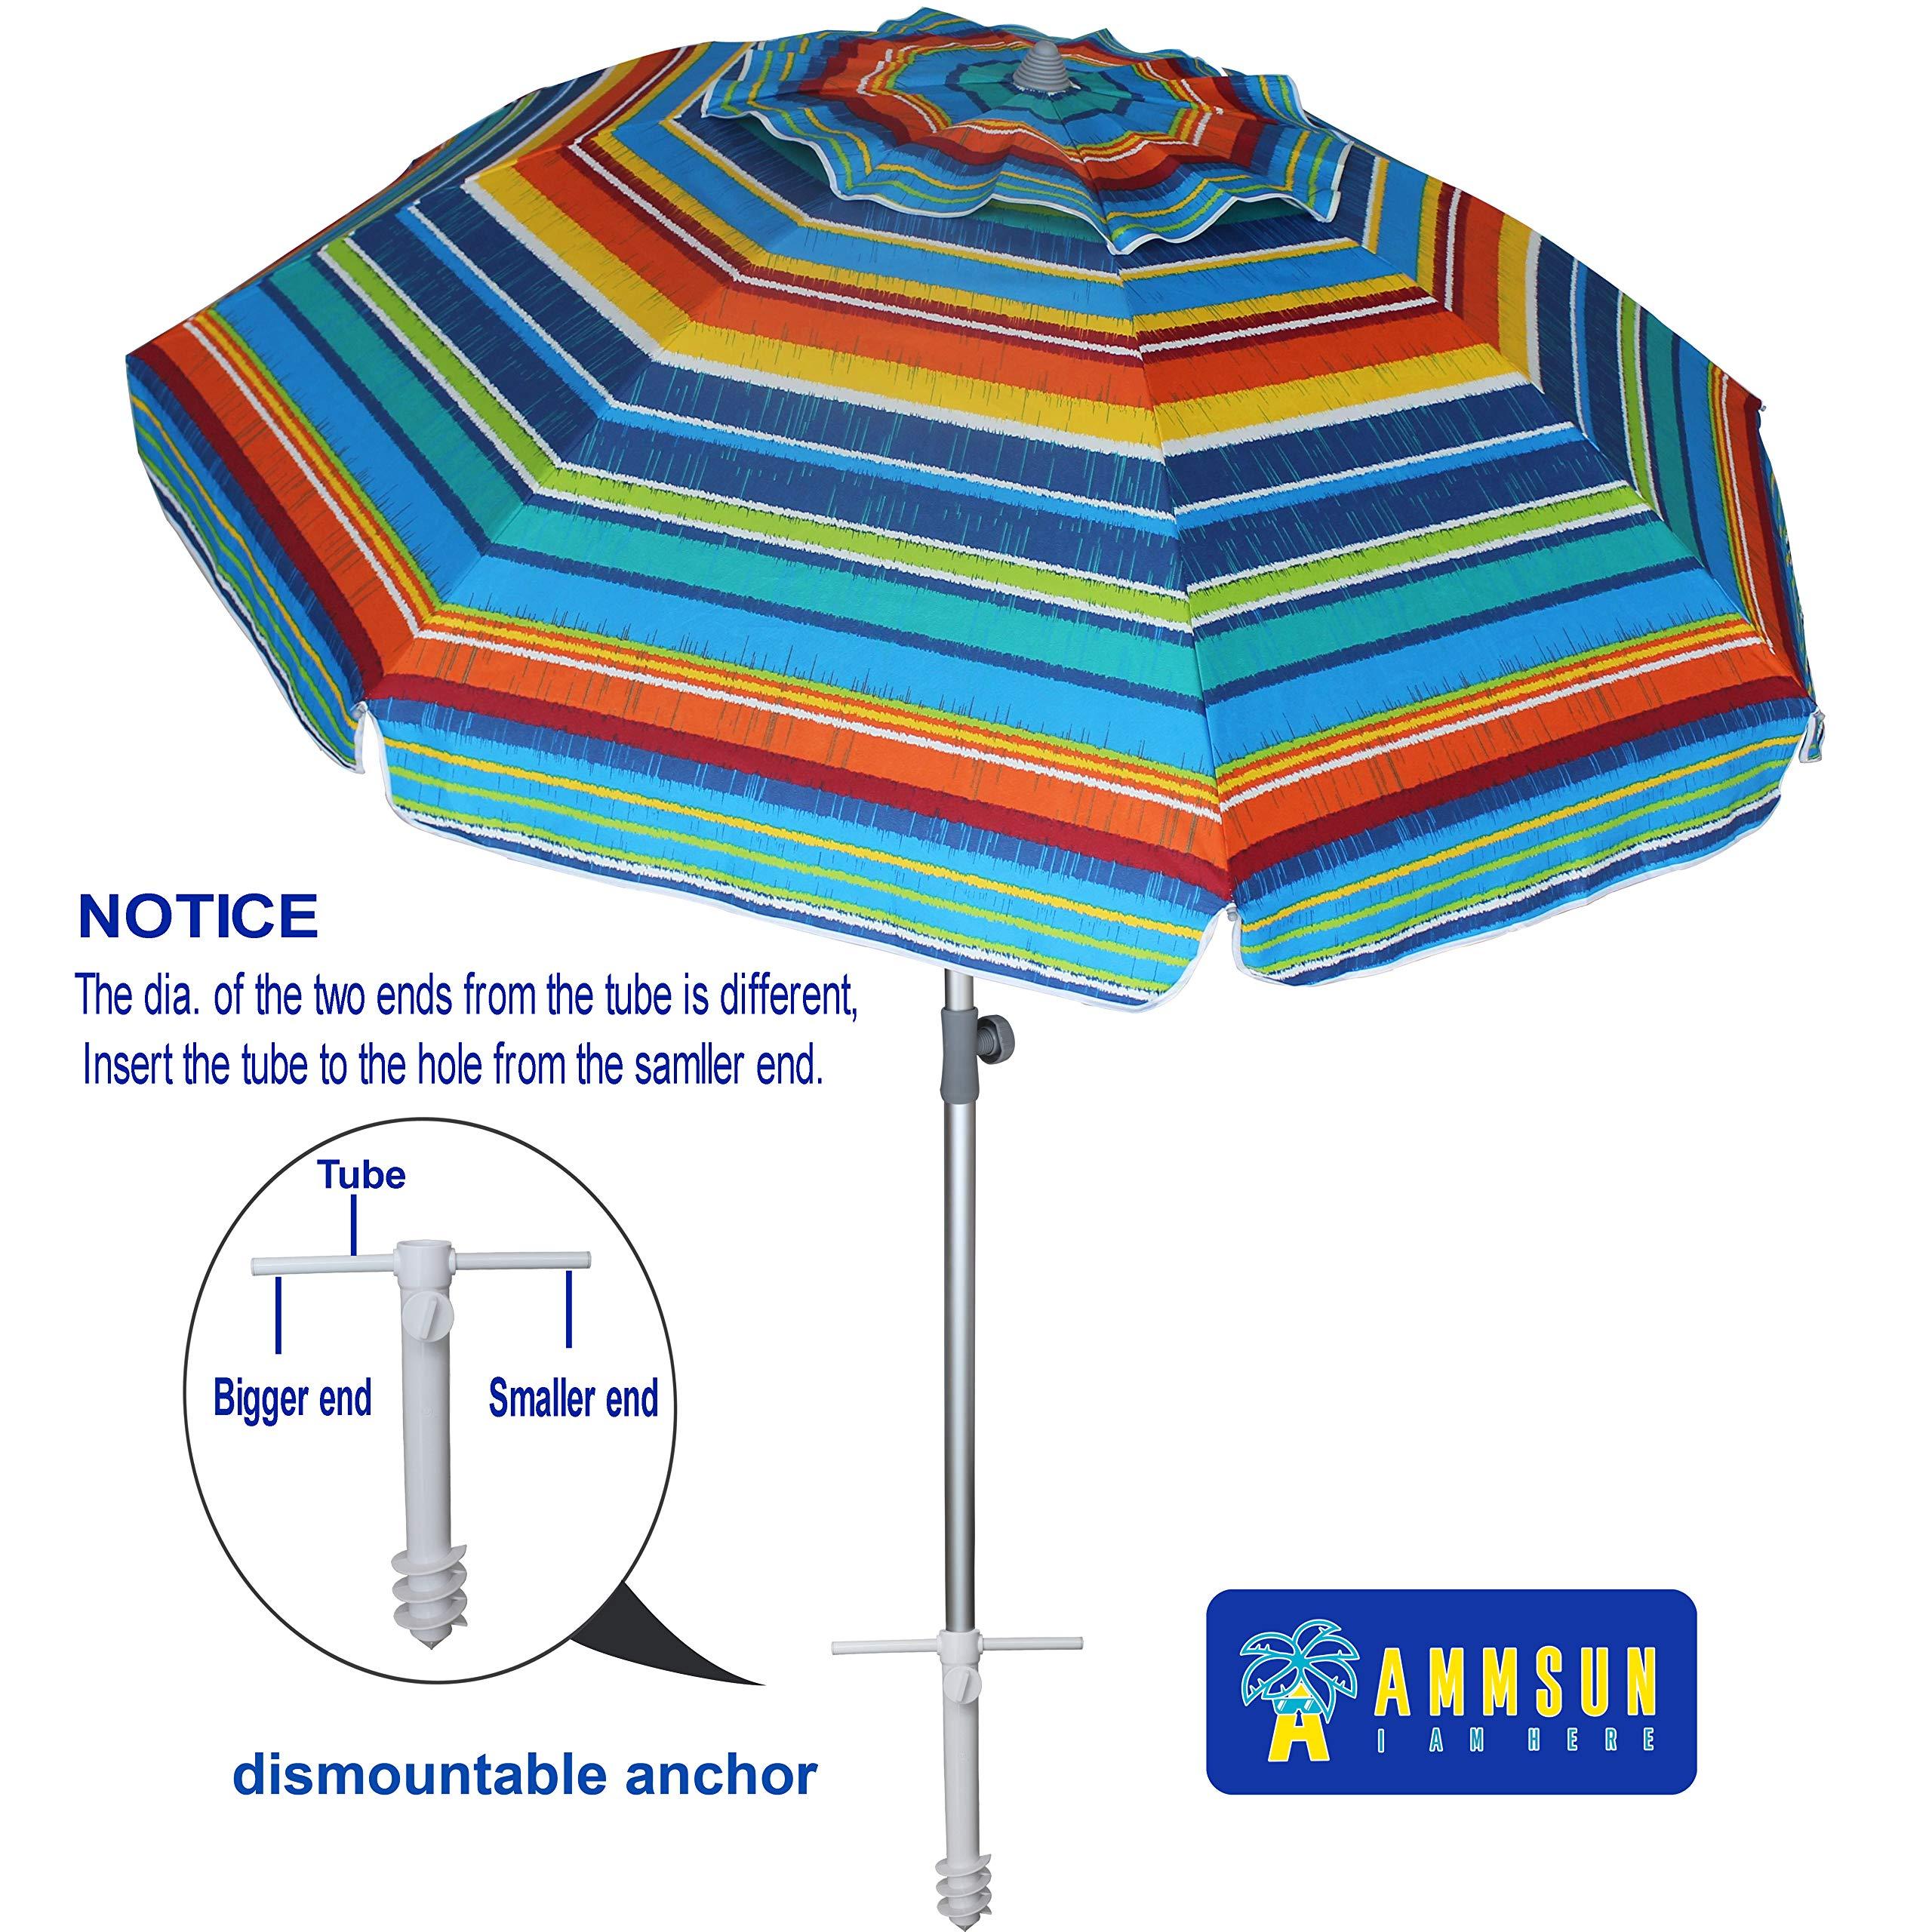 AMMSUN 7ft Beach Umbrella Adjustable Height with Sand Anchor Air Vent Zinc Tilt Silver Coating Inside Telescoping Pole Multicolor Green by AMMSUN